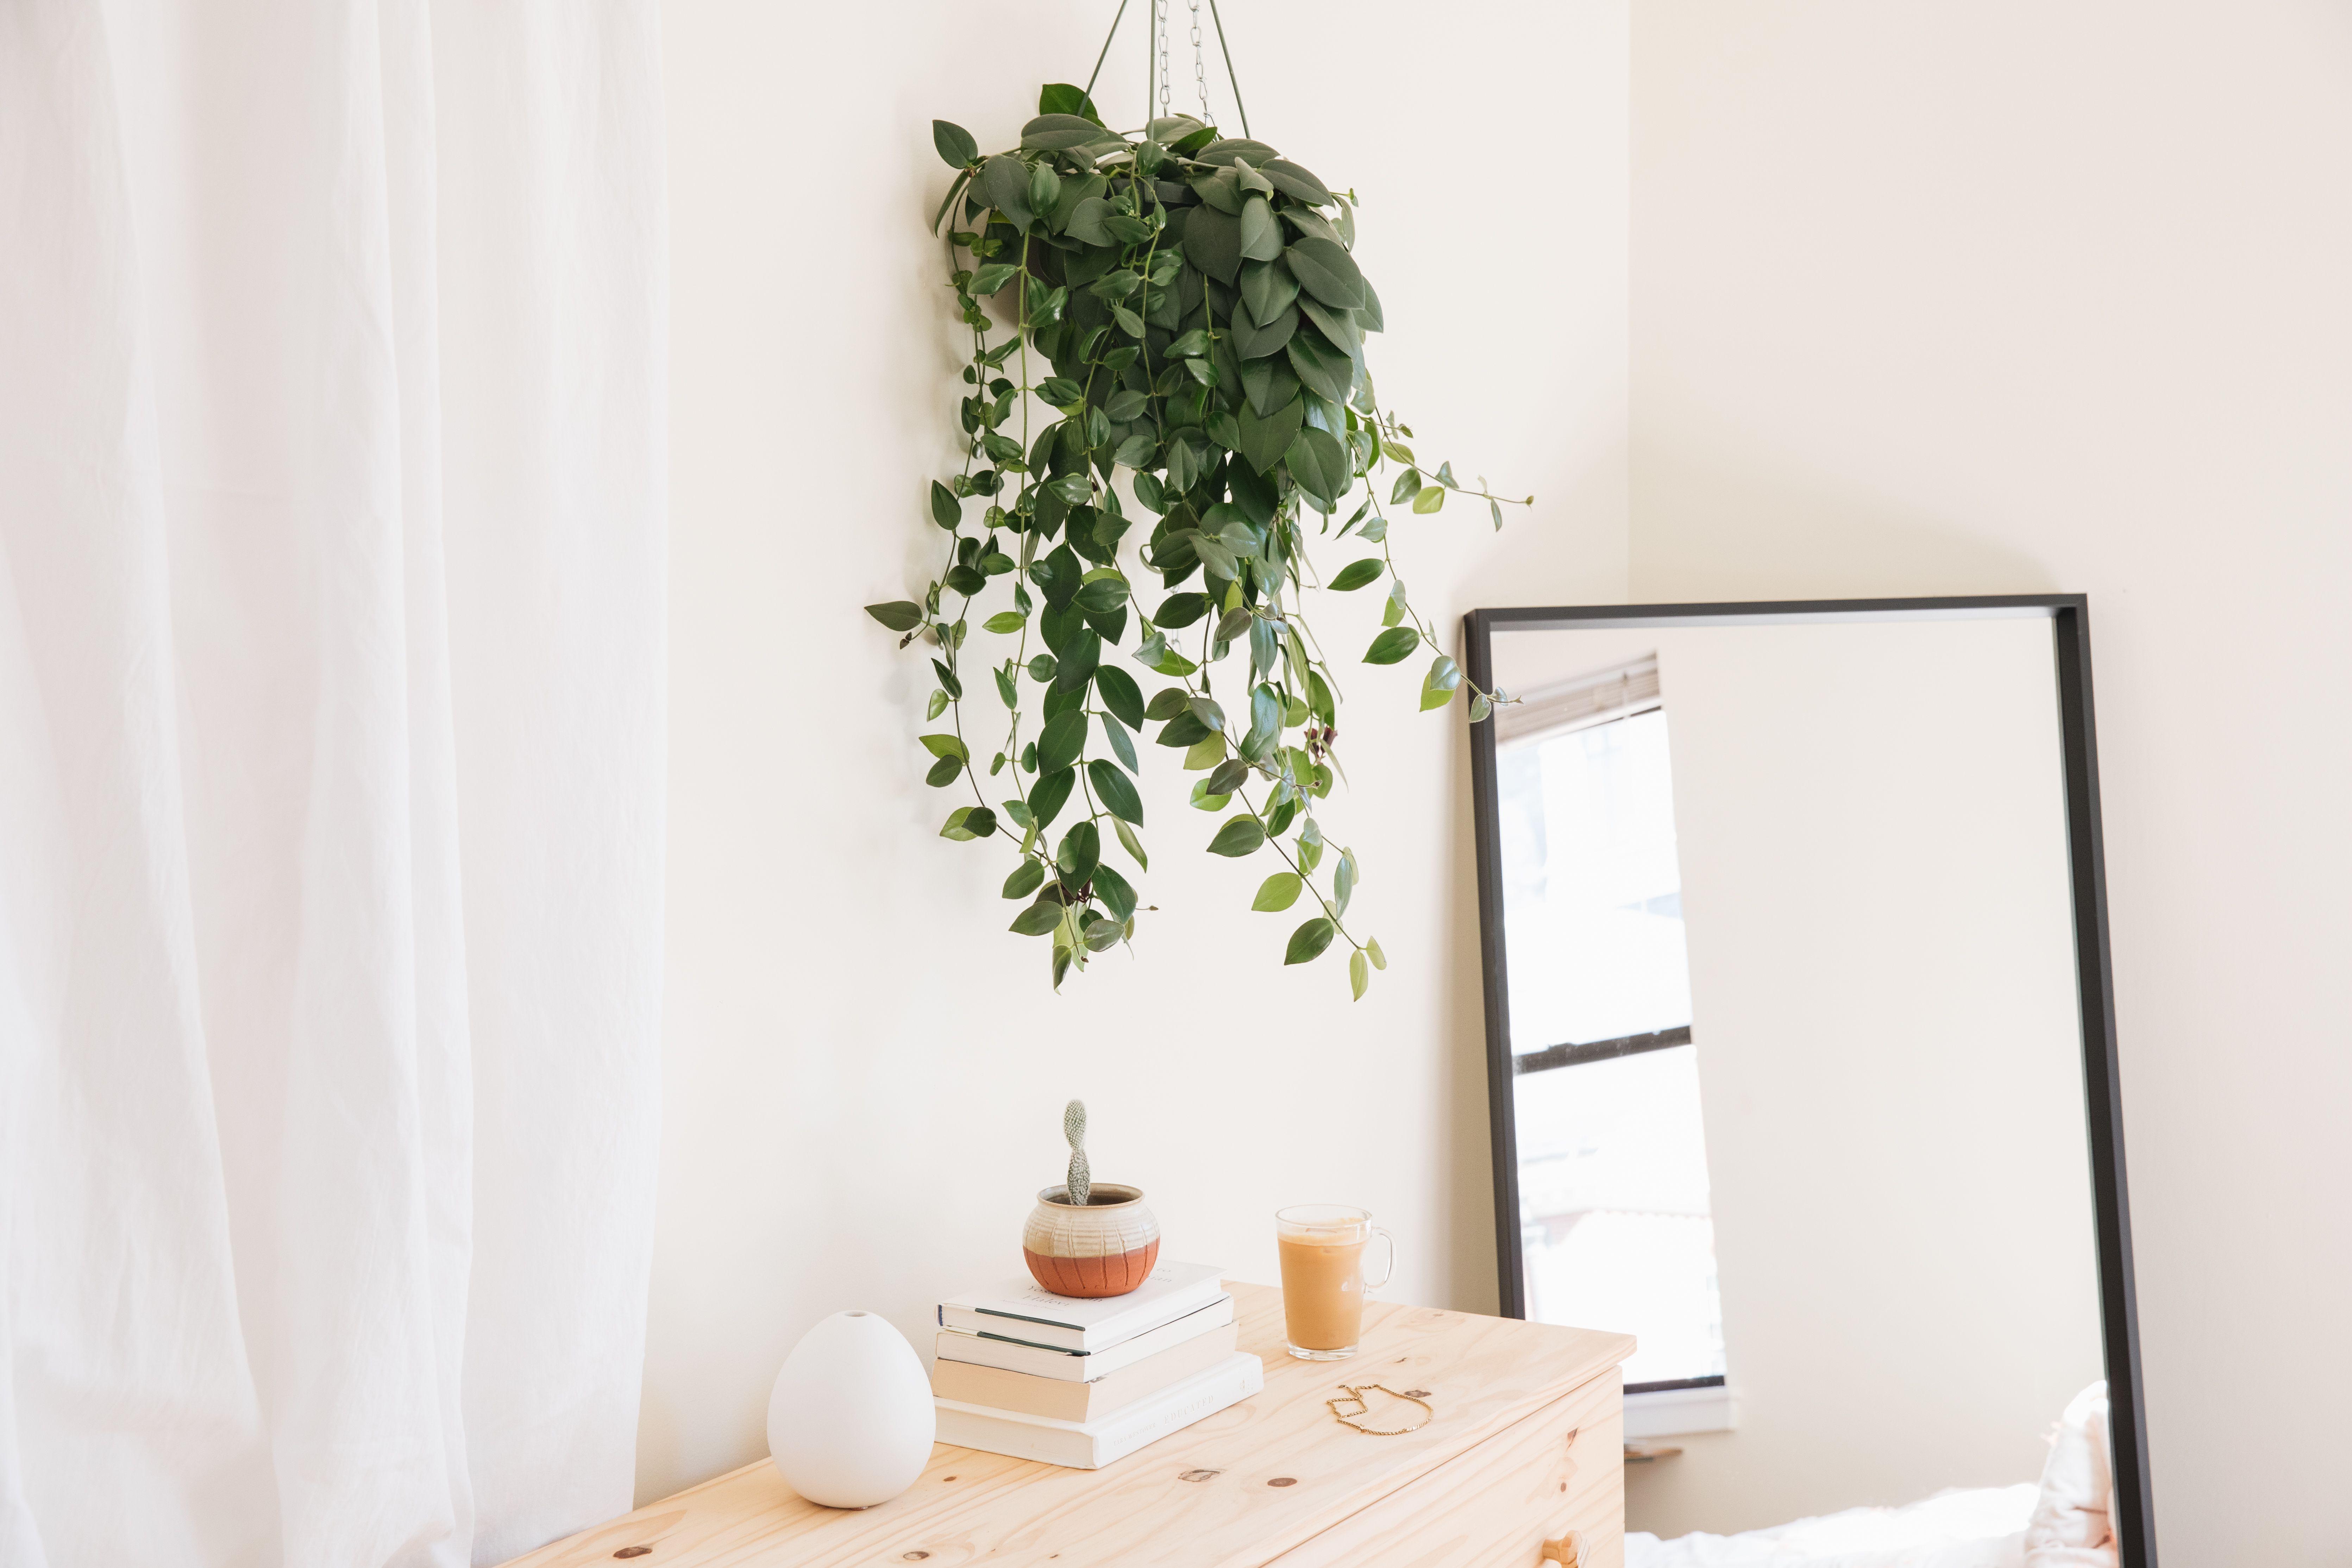 20 Best Houseplants for Hanging Baskets